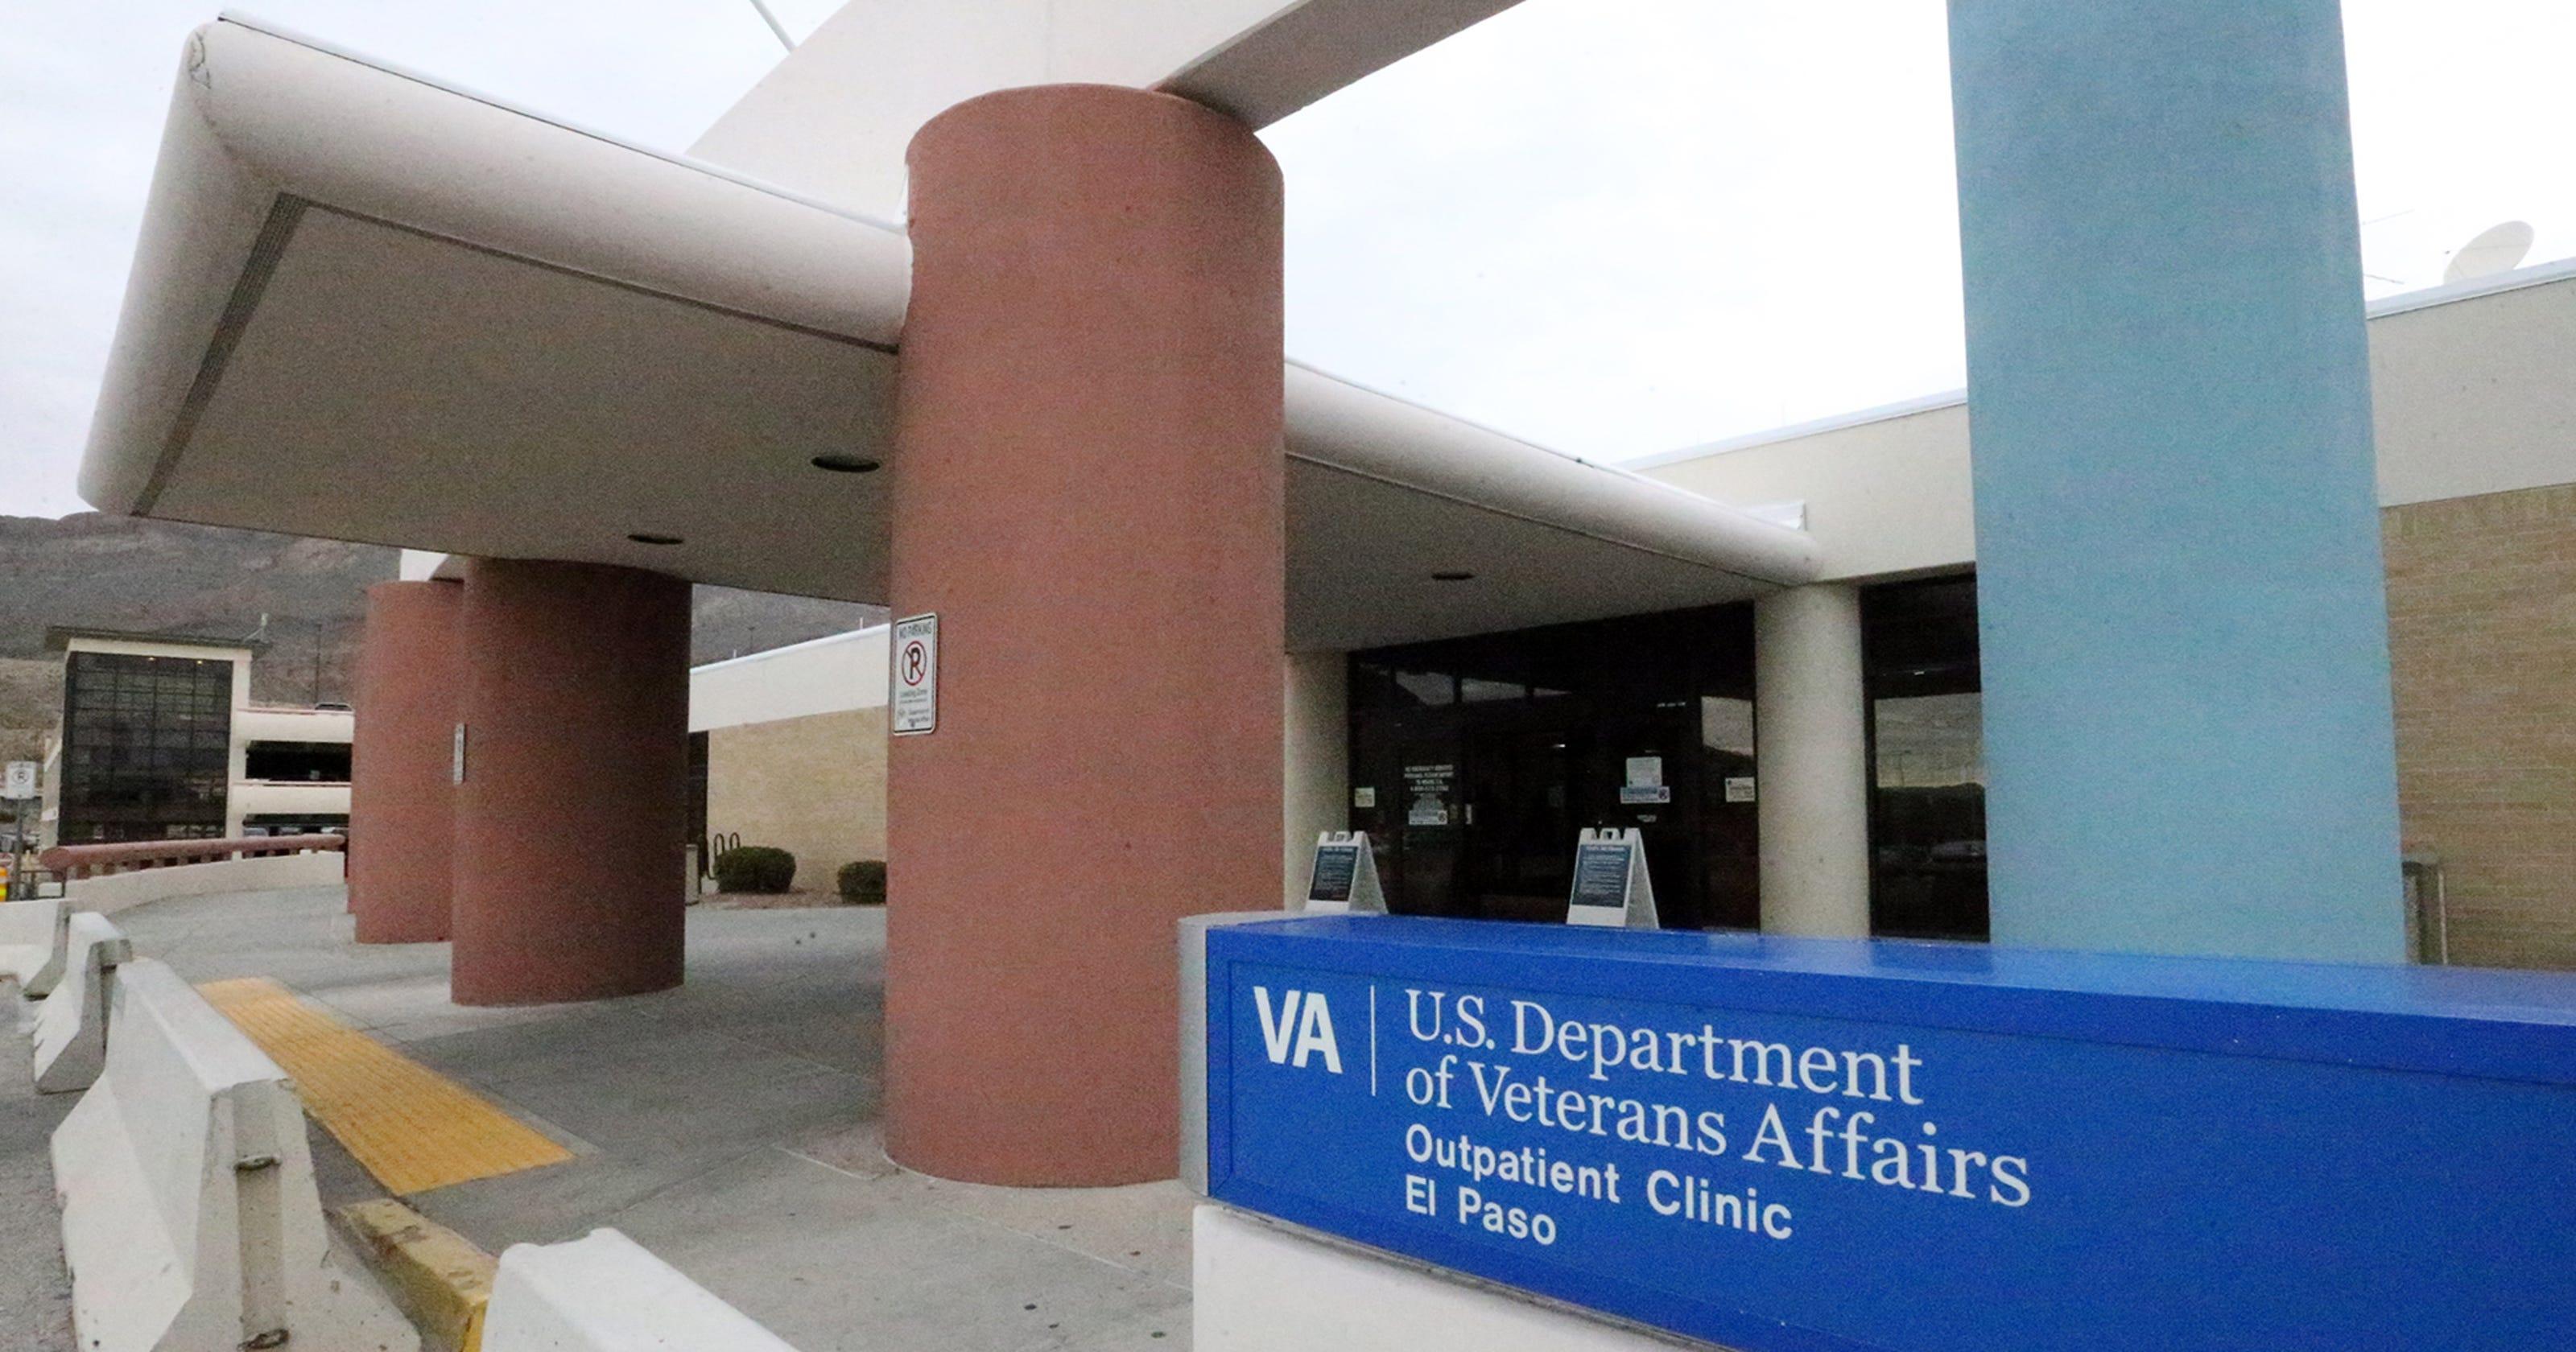 VA needs to improve on mental health care: Reader